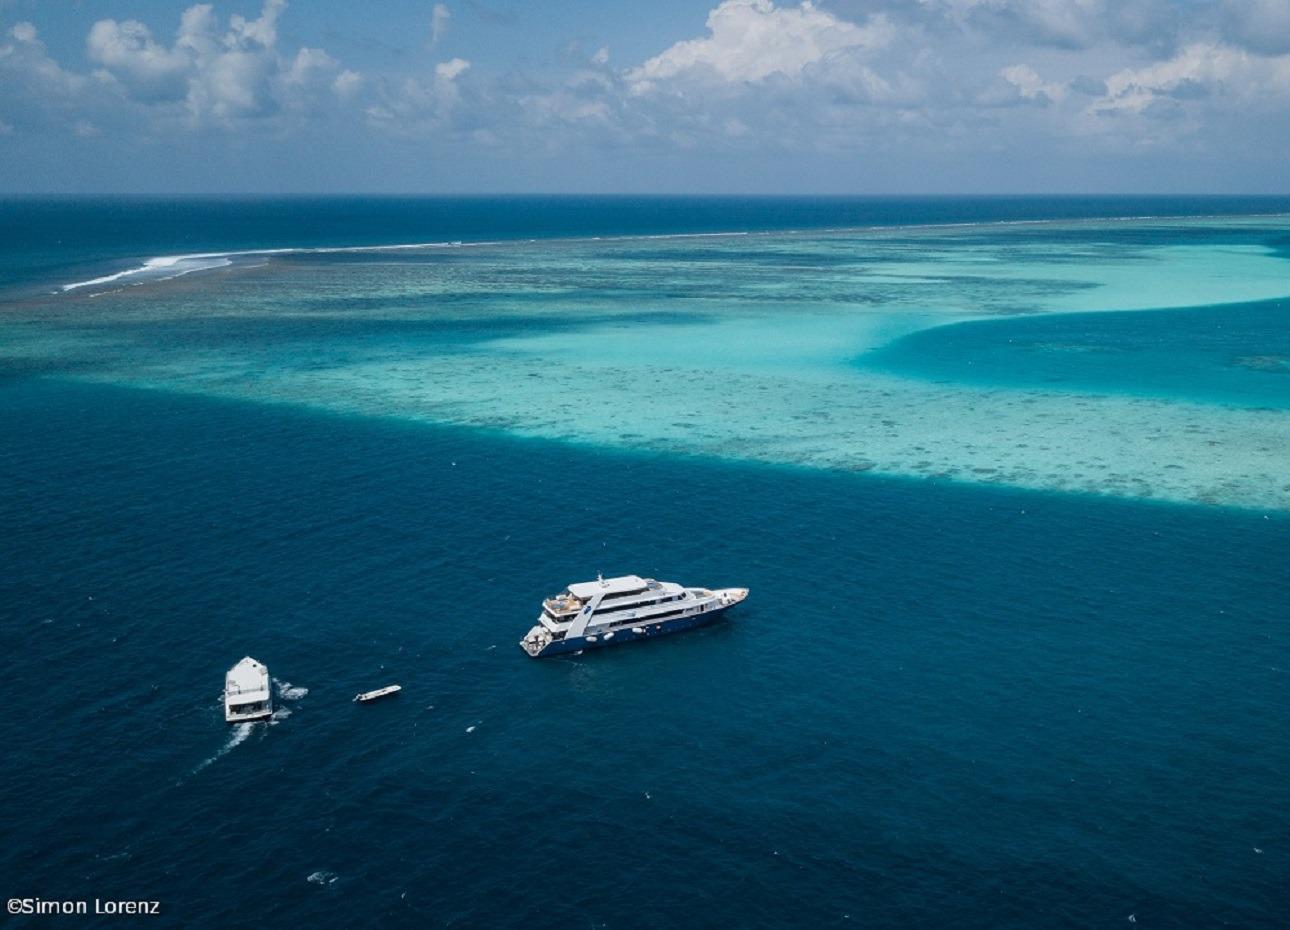 Blue Voyager exploring the Indian Ocean, Maldives, image credited to Simon Lorenz